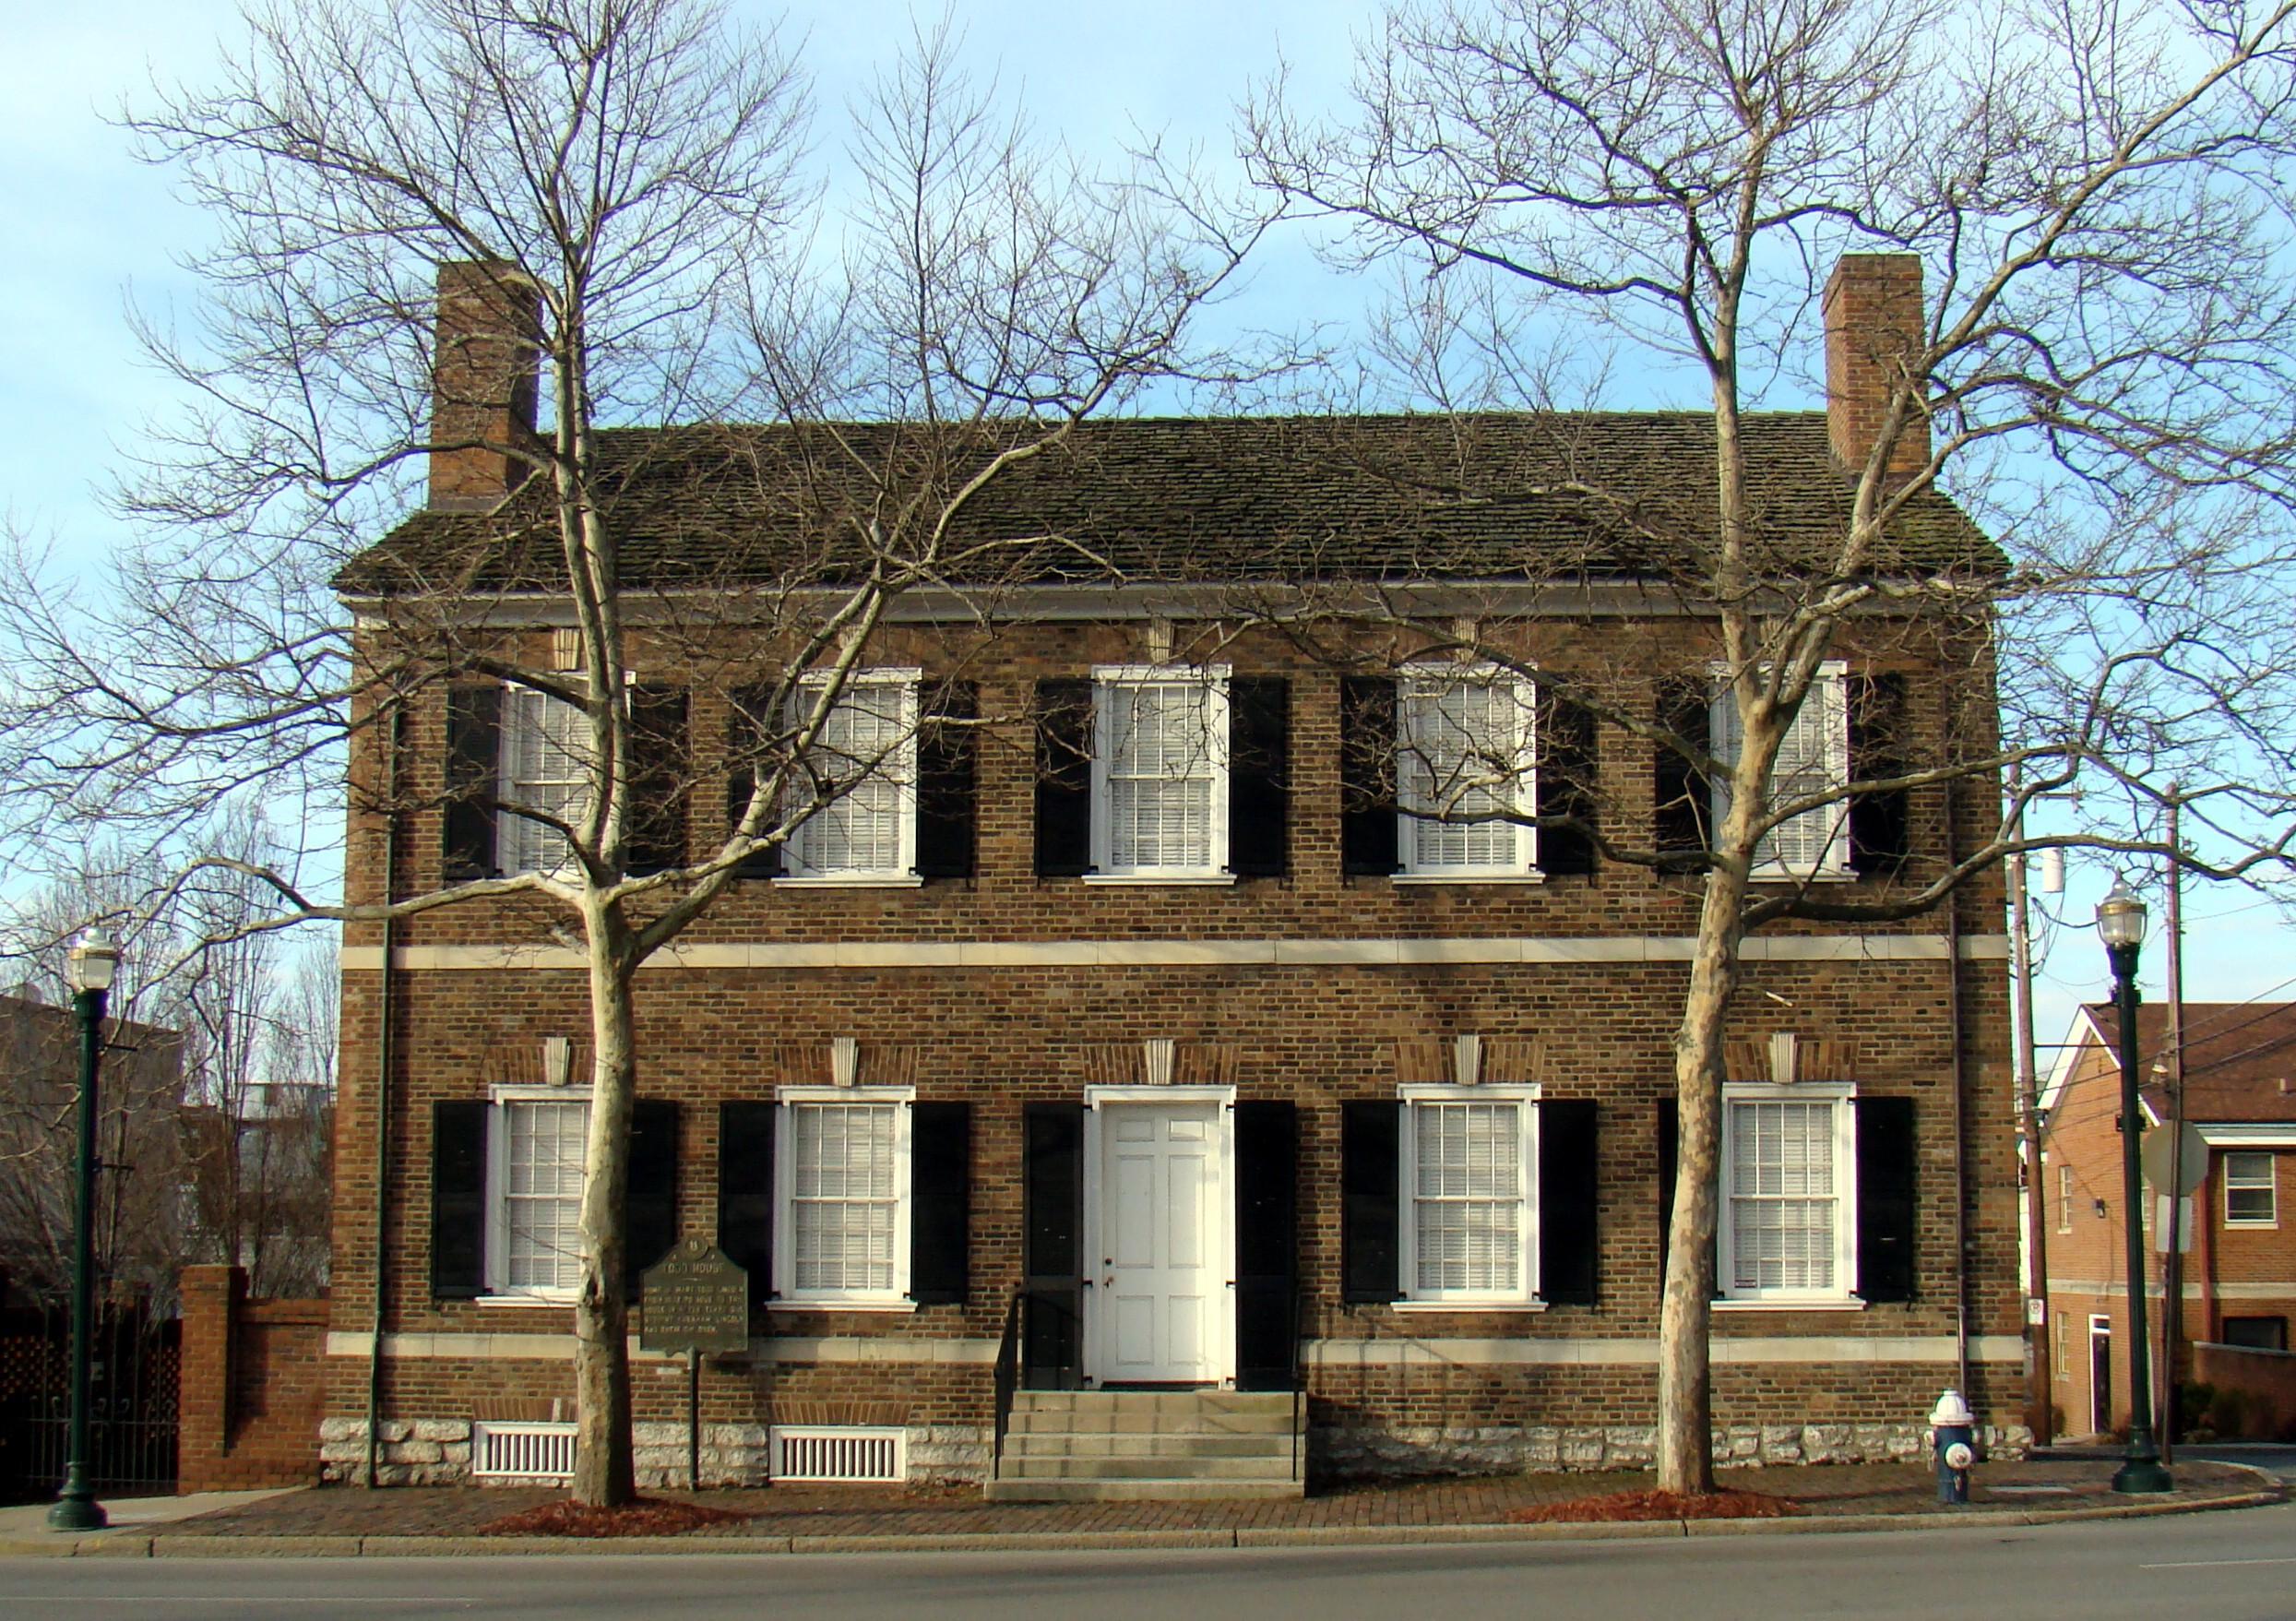 File:Mary Todd Lincoln House, Lexington Kentucky 2.jpg